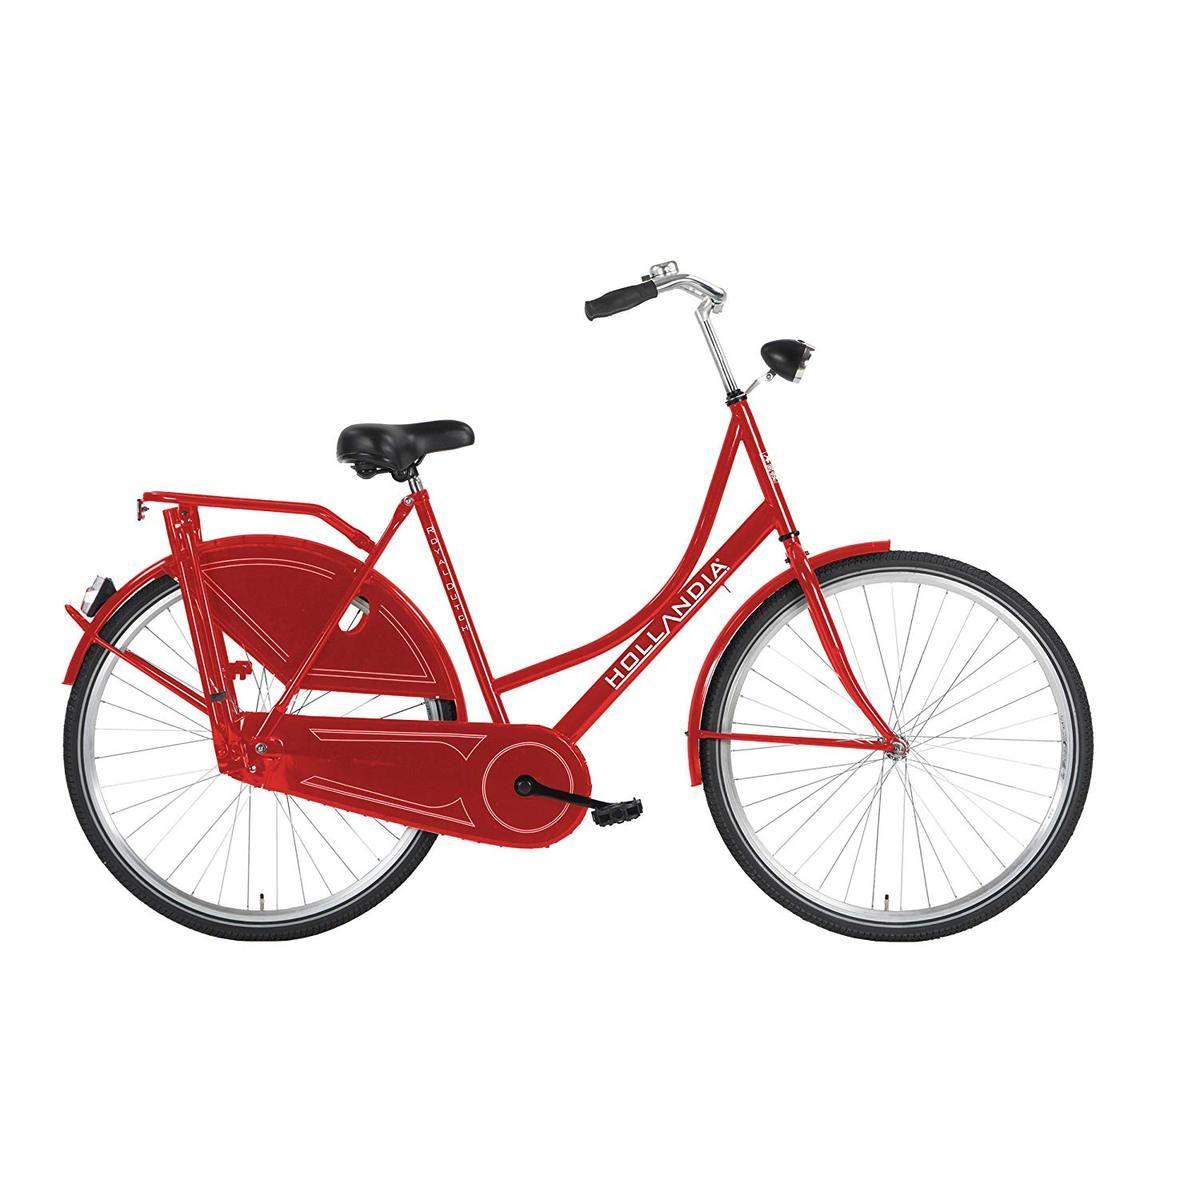 Hollandia Royal Dutch Bicycle Single Speed 700c X 22 Inch Red